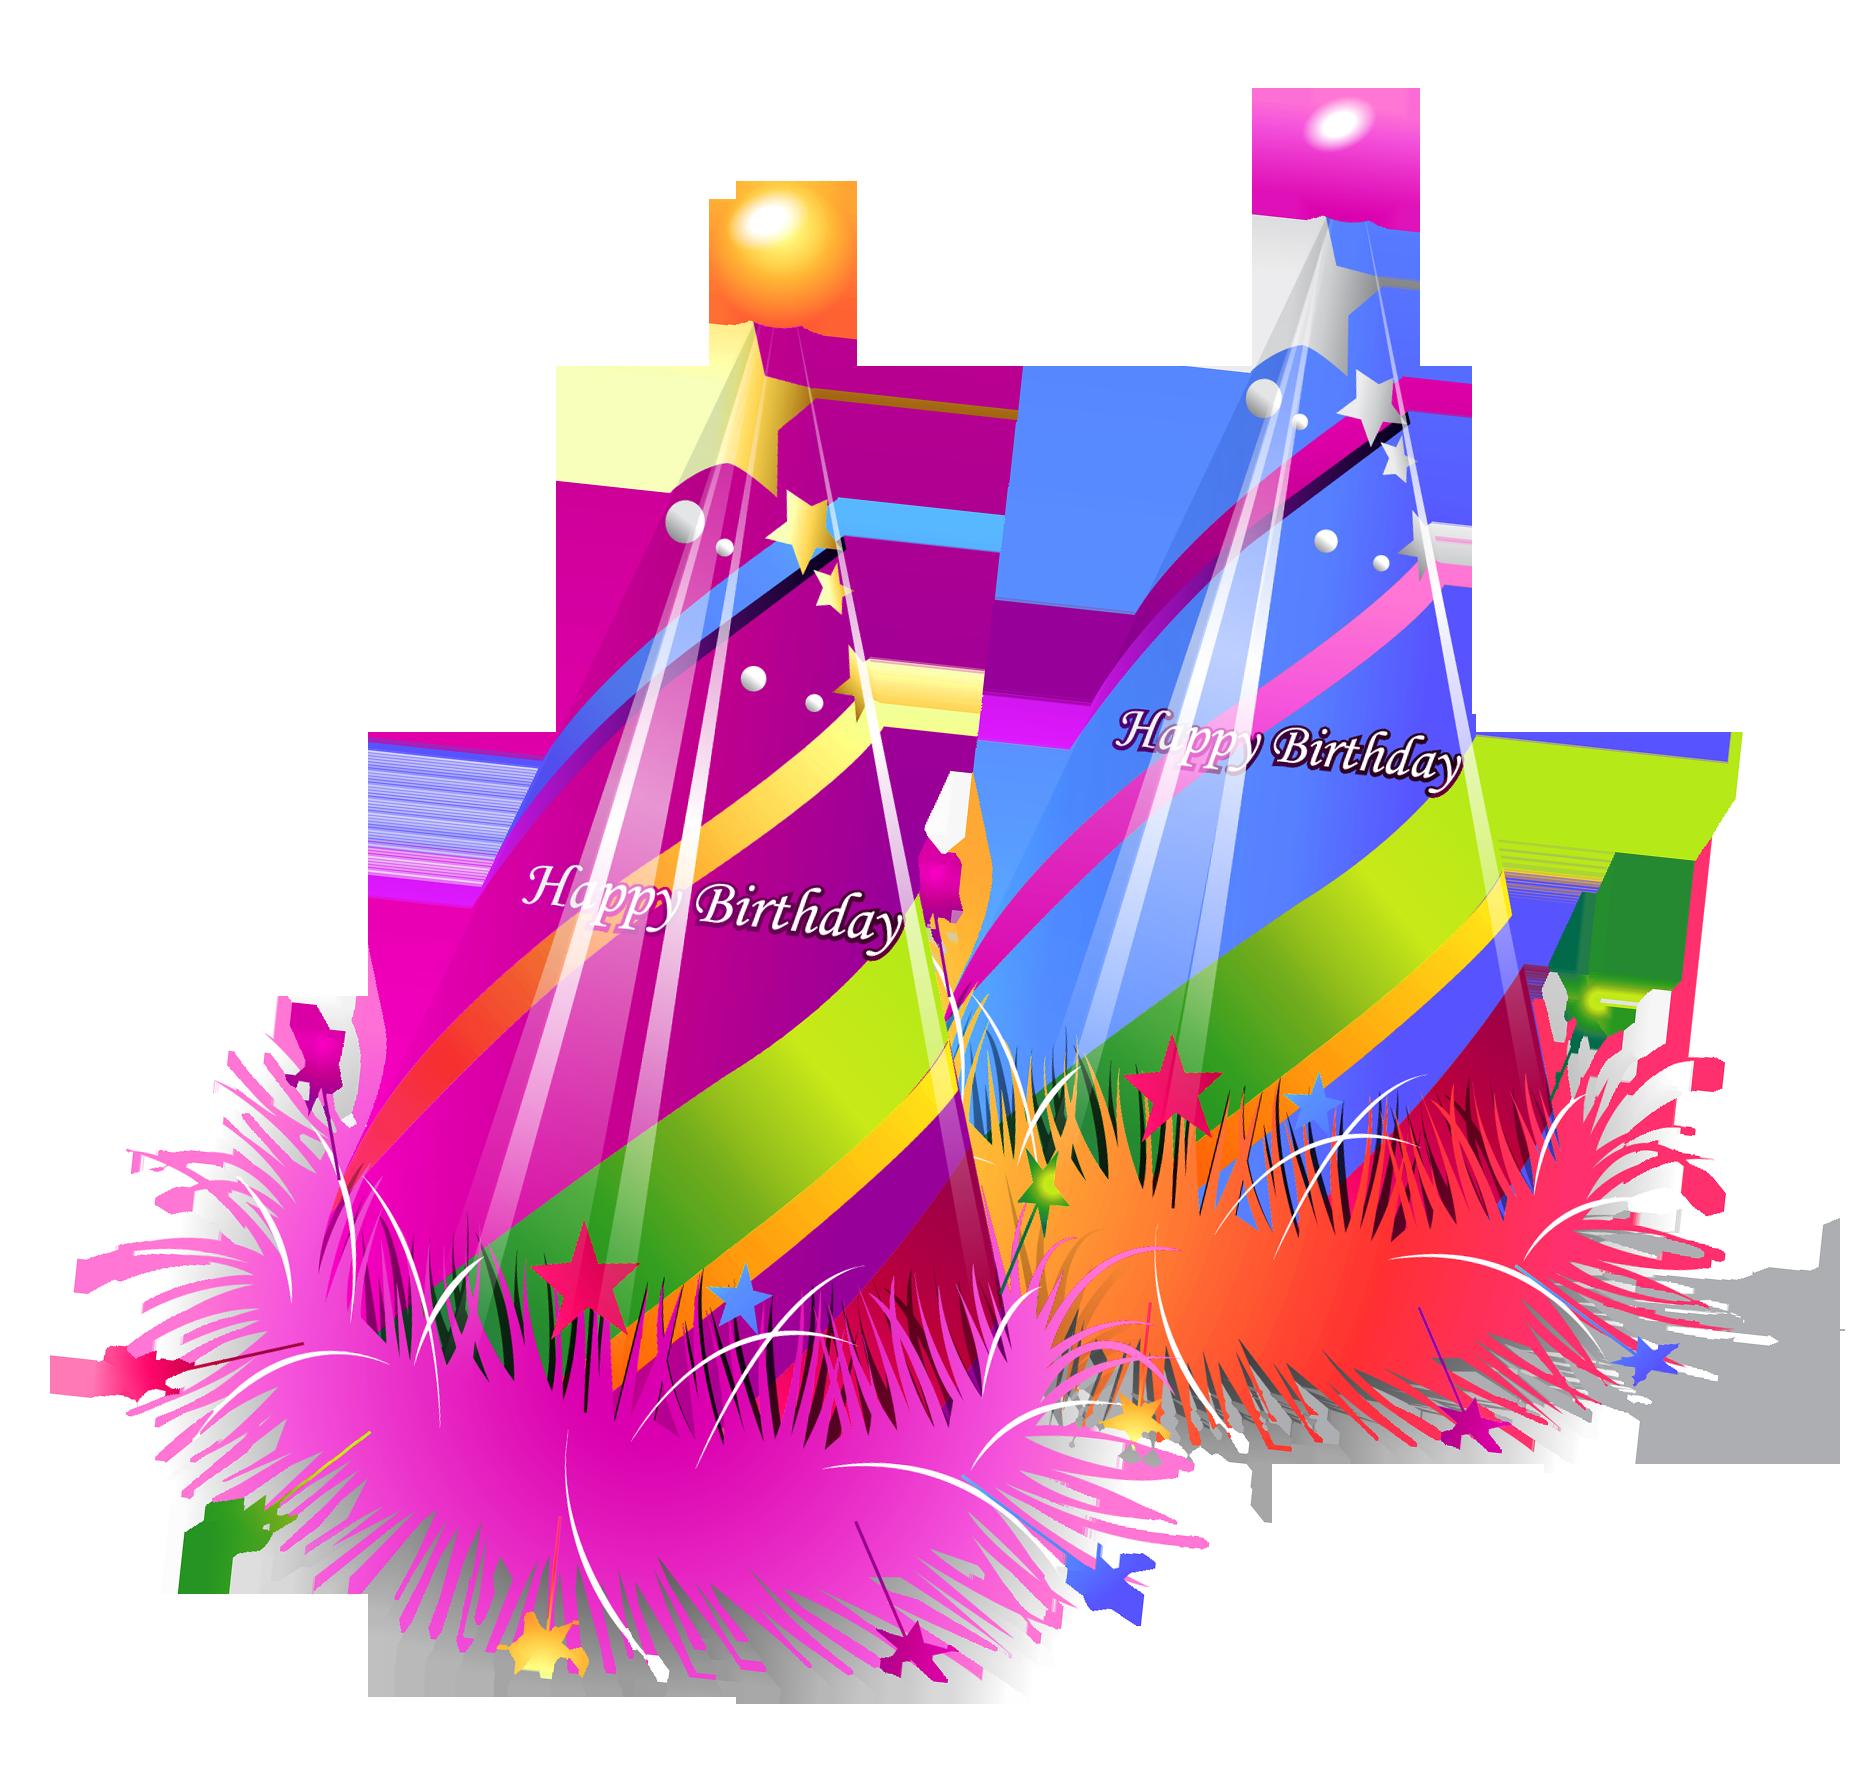 Birthday Caps PNG Image